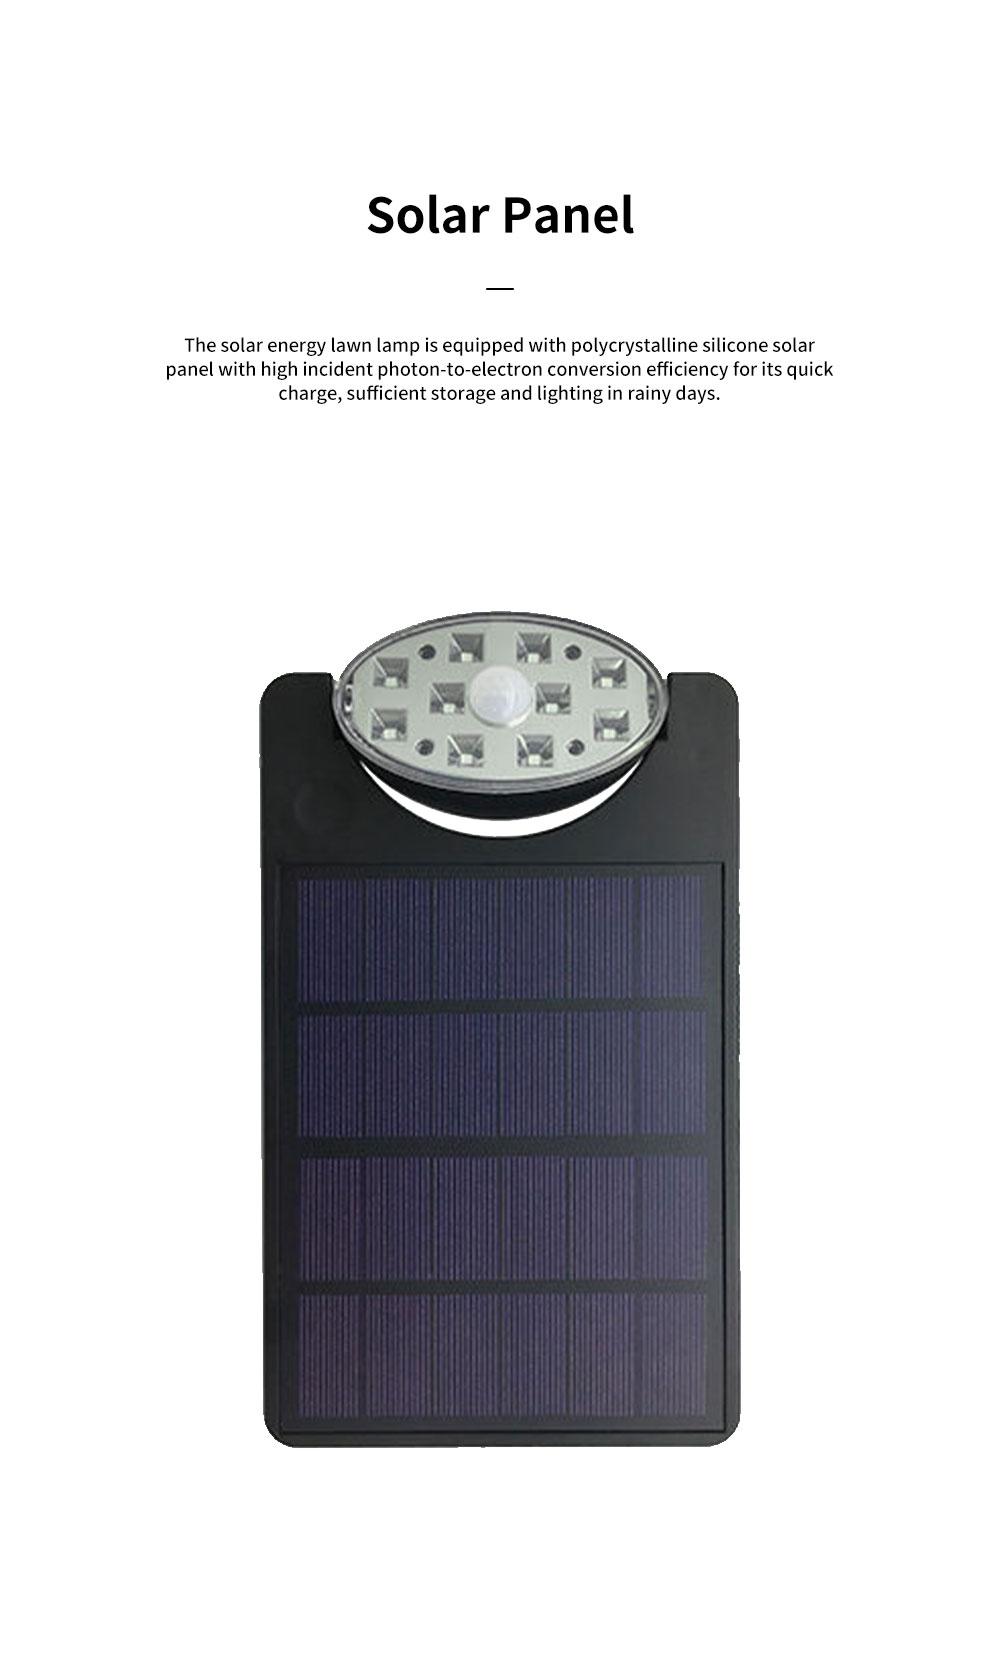 Solar Energy Ultra Thin Wall Lamp for Lawn Lighting Decoration Body Sensing Flat Panel Lawn Light Ultrathin Waterproof Lawn Lamp 1